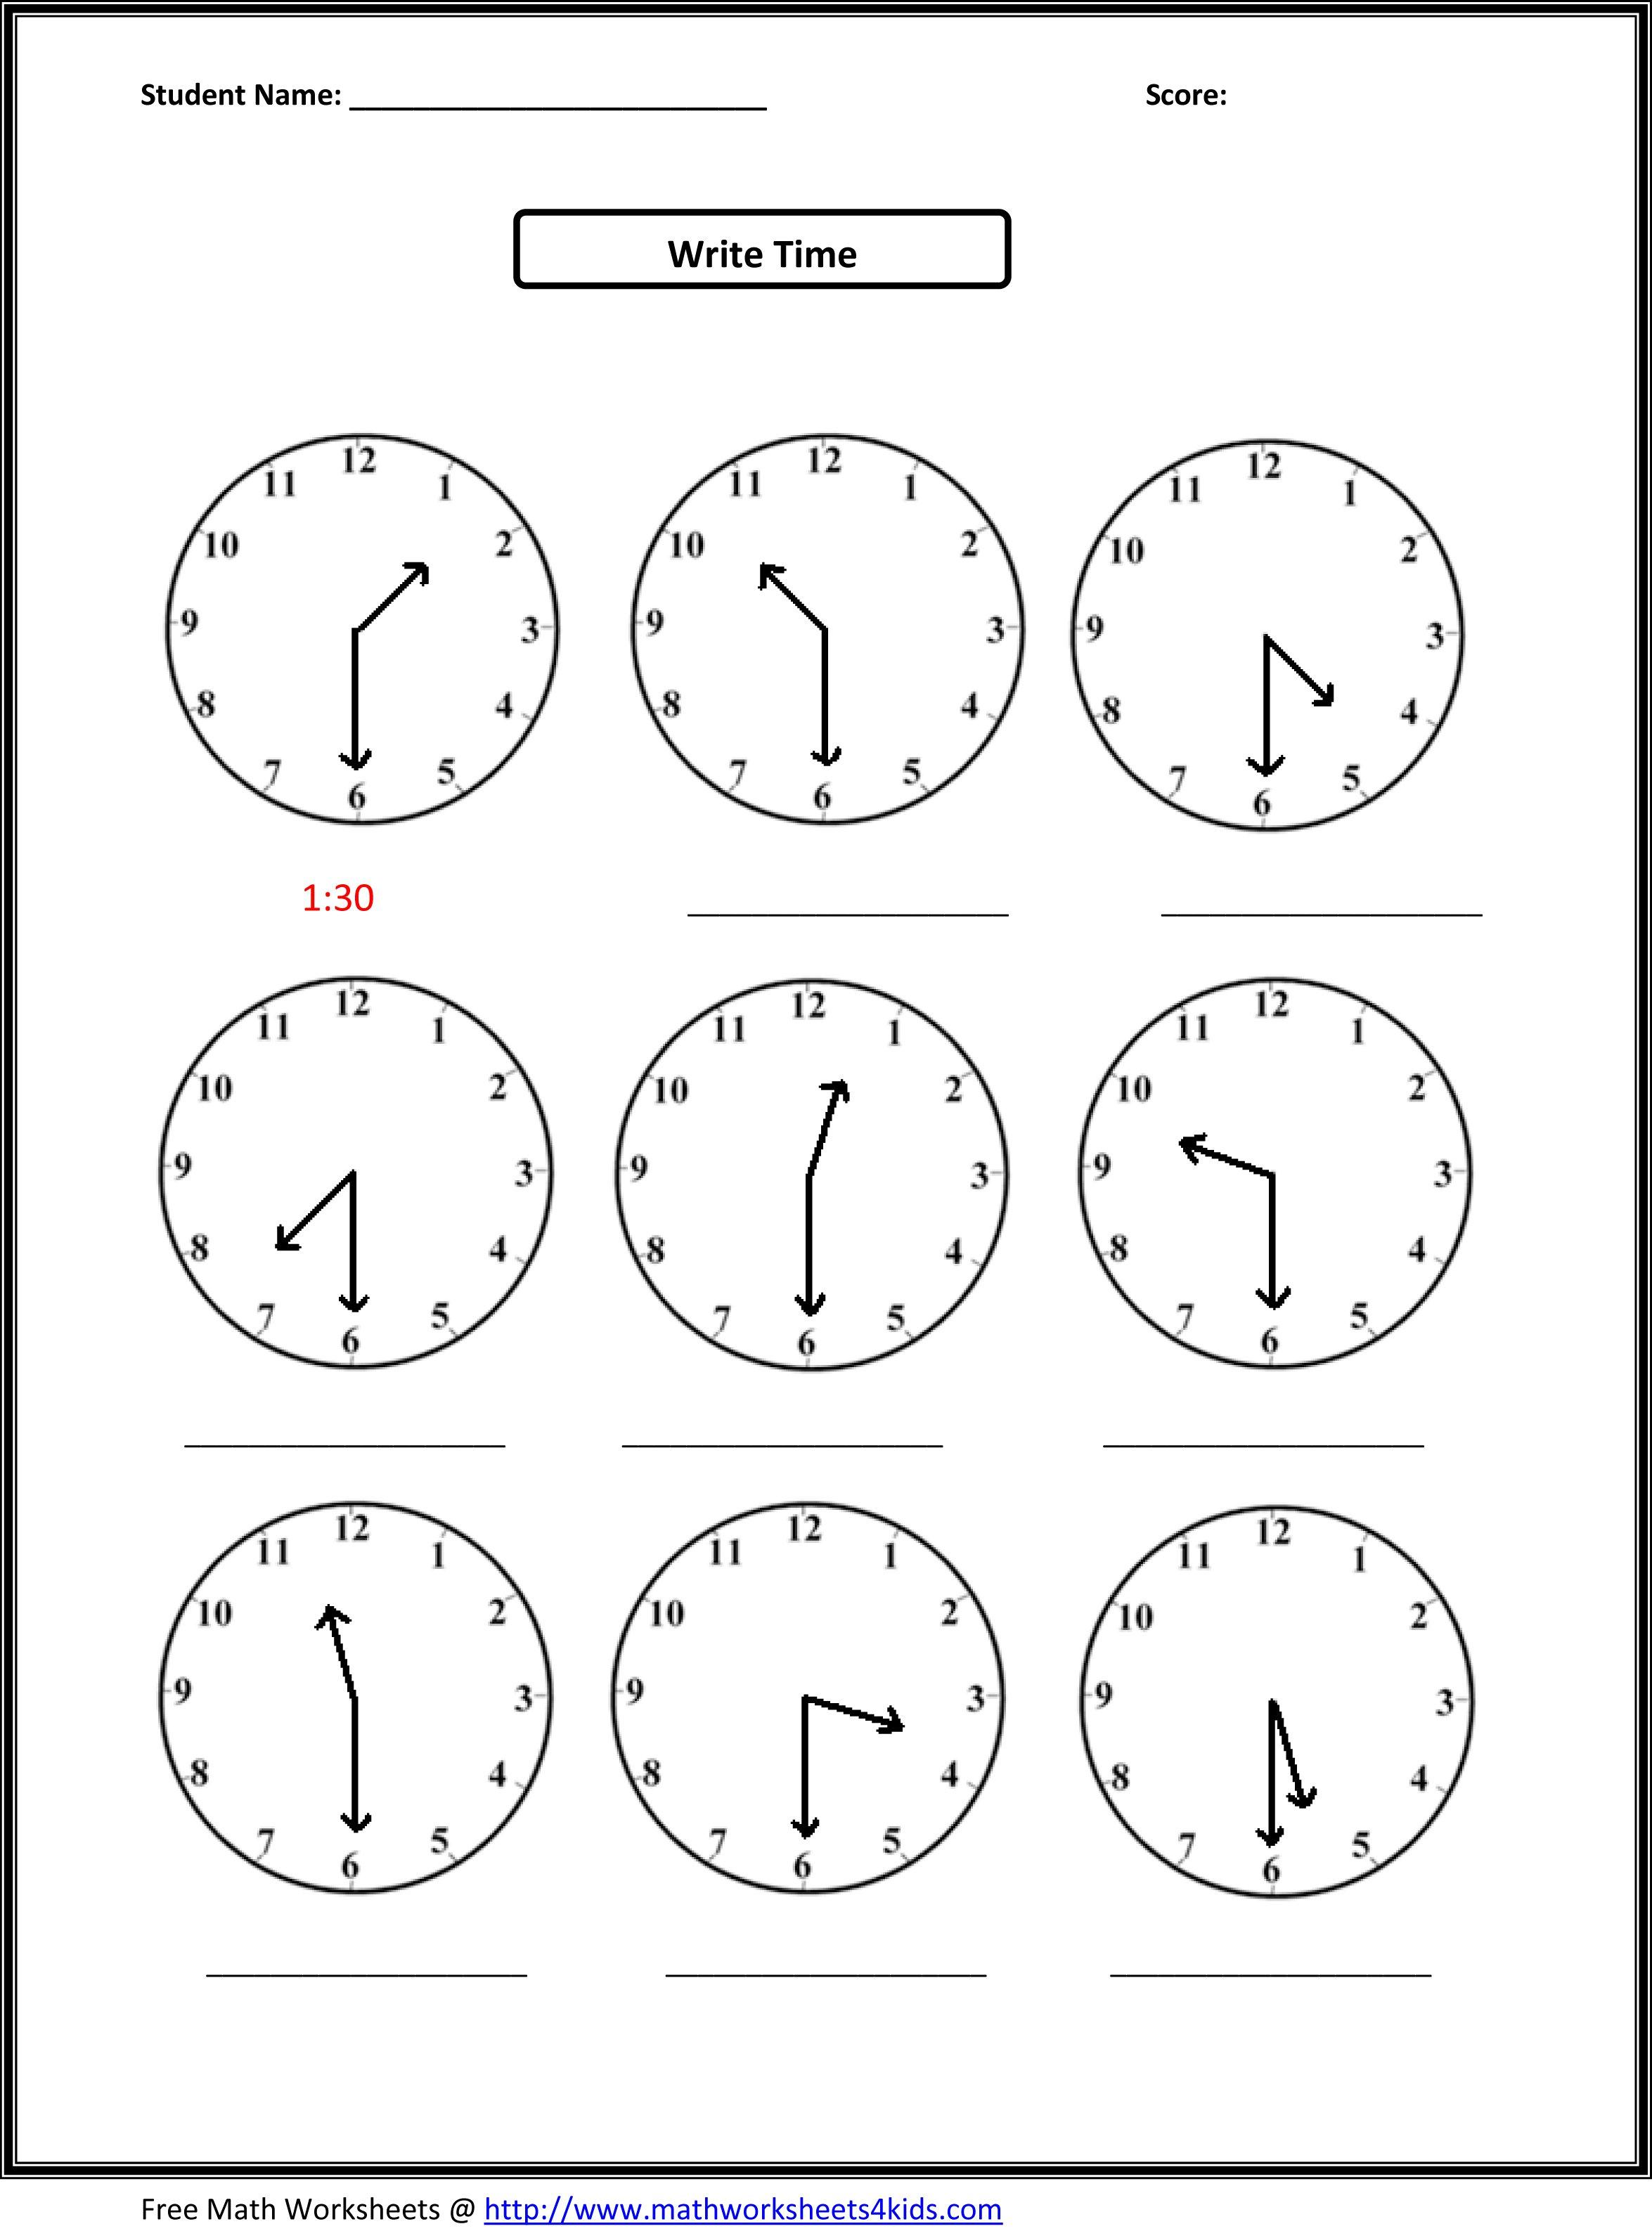 Math For Second Graders Printable Worksheets The Best Worksheets